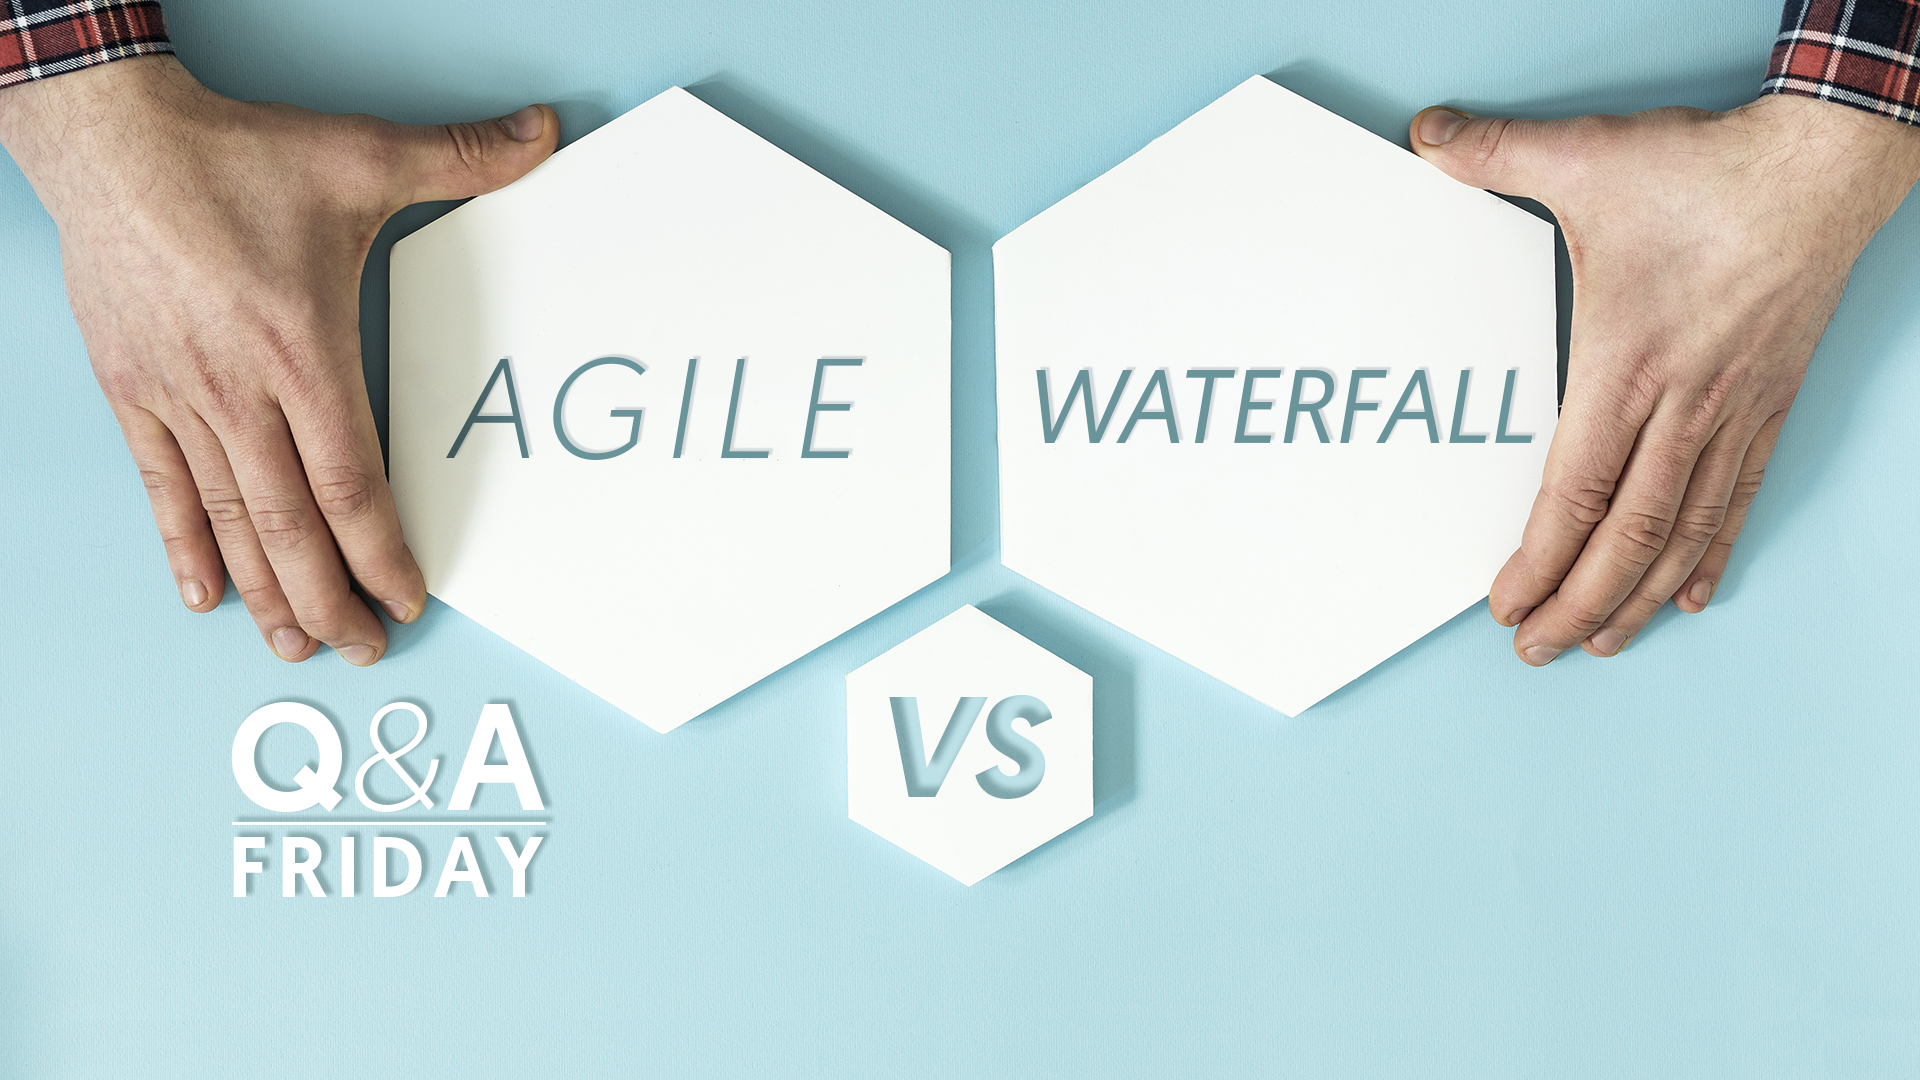 Q&A-Storey-Agile-vs-Waterfall-TitleScreen